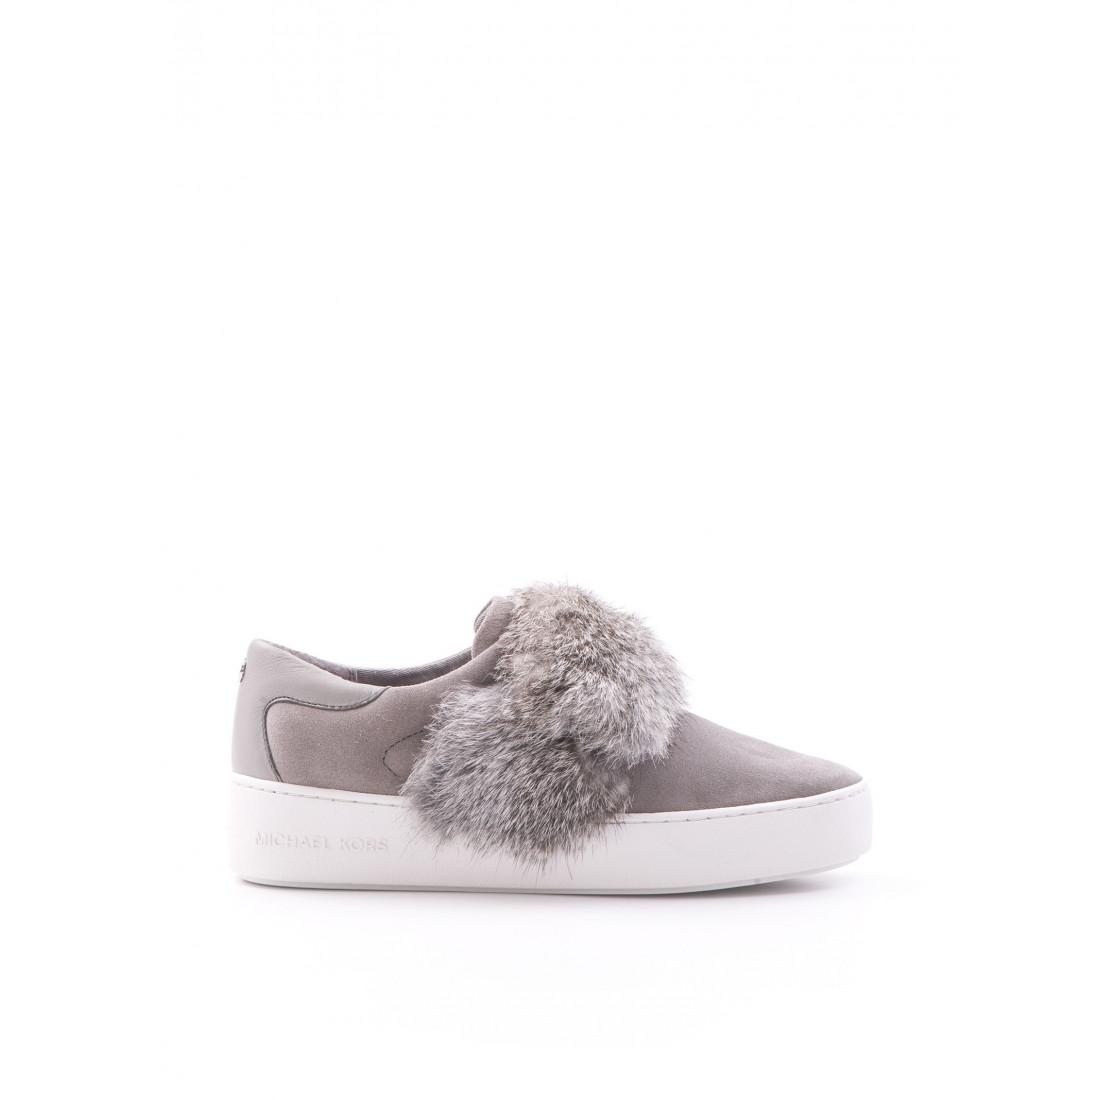 sneakers donna michael kors 43f6mvfp1s081 maven pearl grey